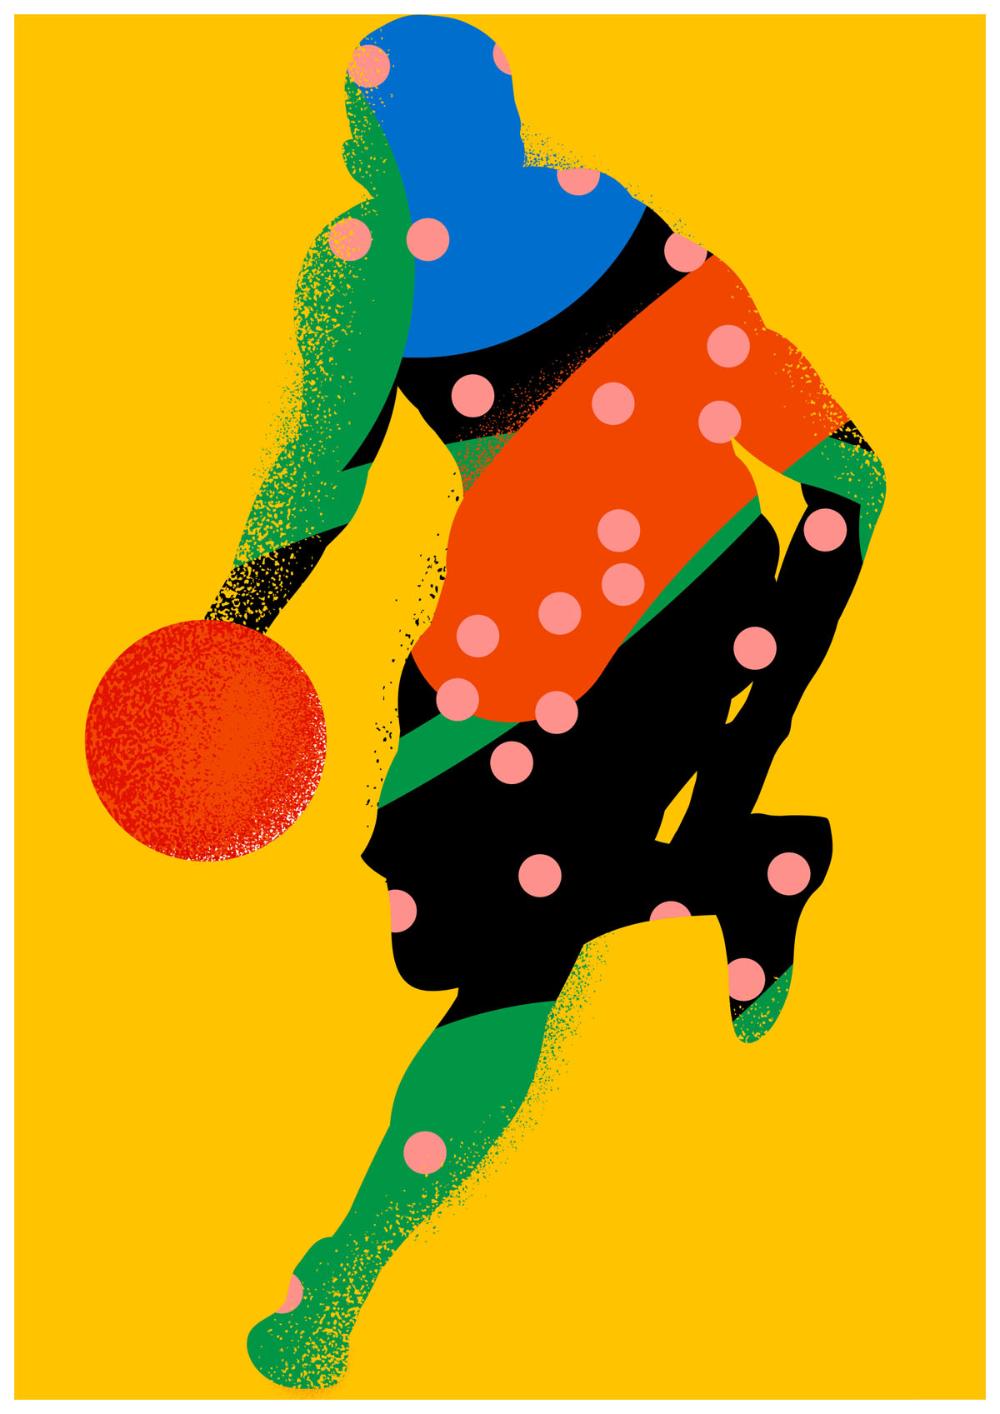 Karan Singh creates vibrant illustrations for the